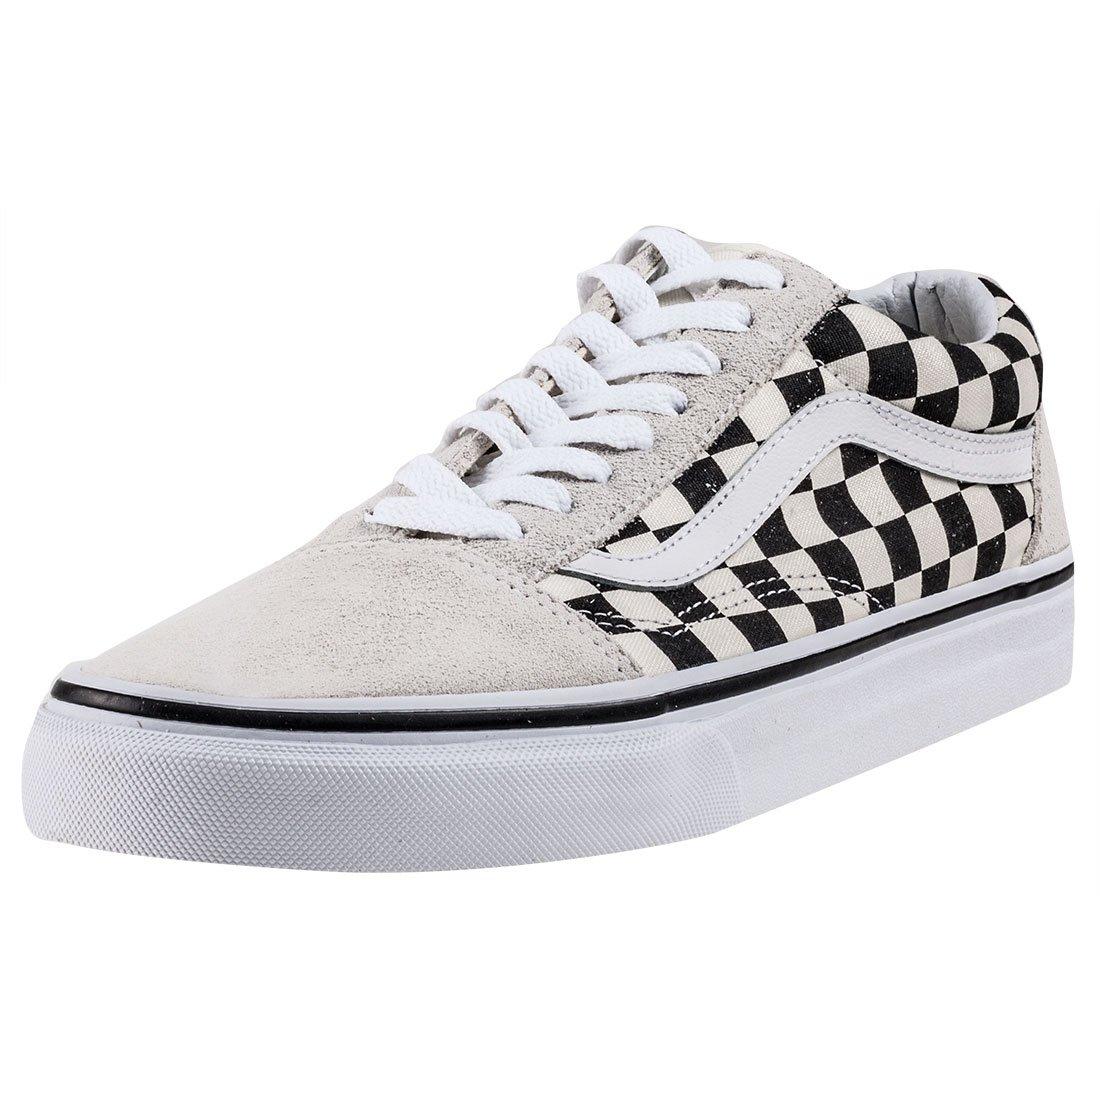 Vans Unisex Old Skool (Checkerboard) White/Black VN0A38G127K Mens Size 9, Womens 10.5